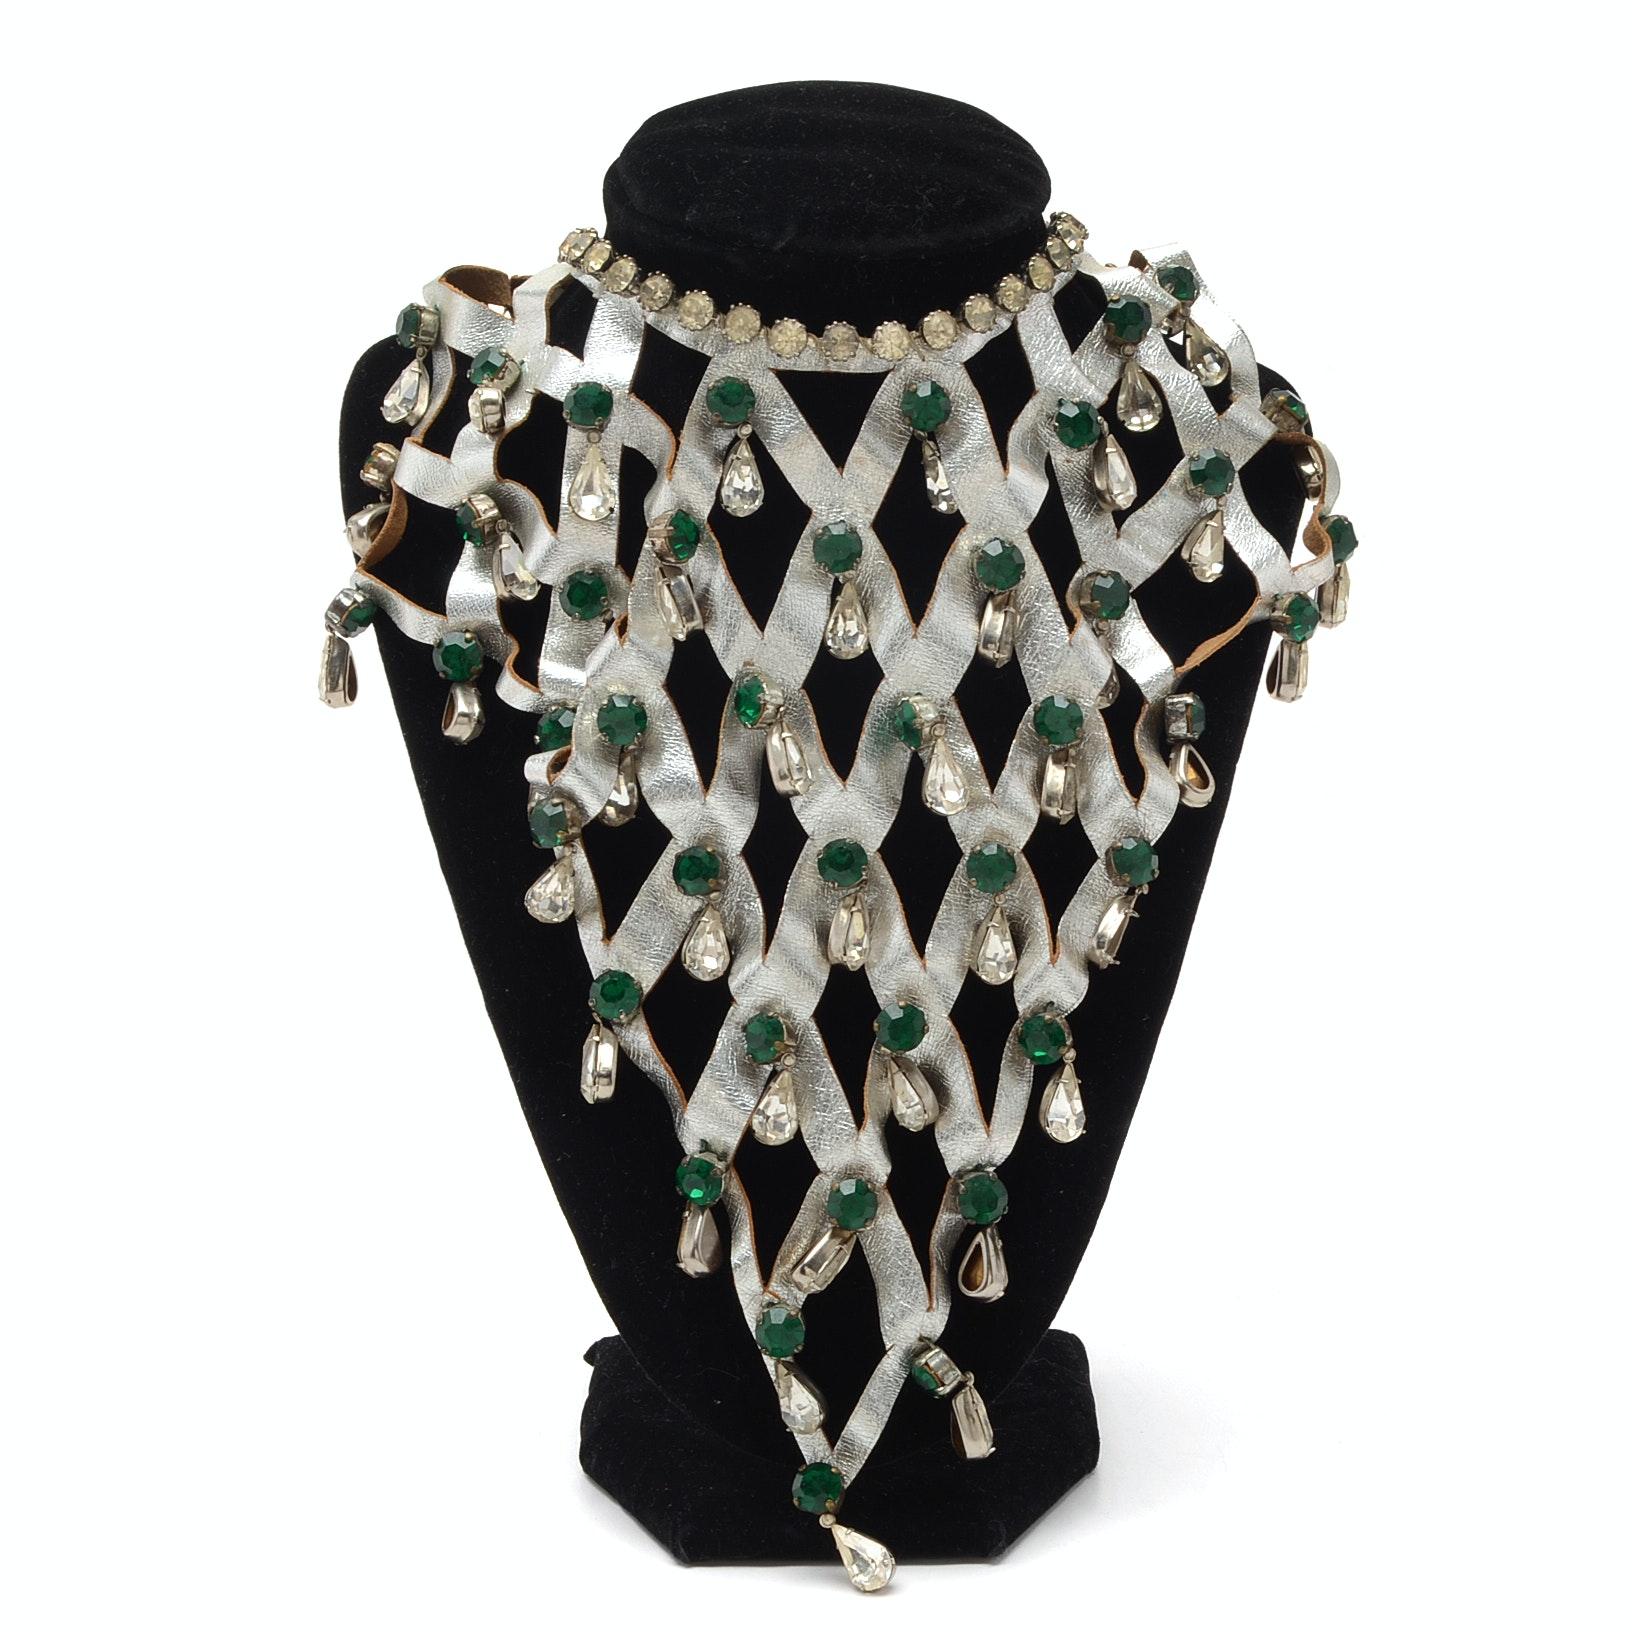 Lee Menichetti Vintage Glass and Rhinestone Necklace